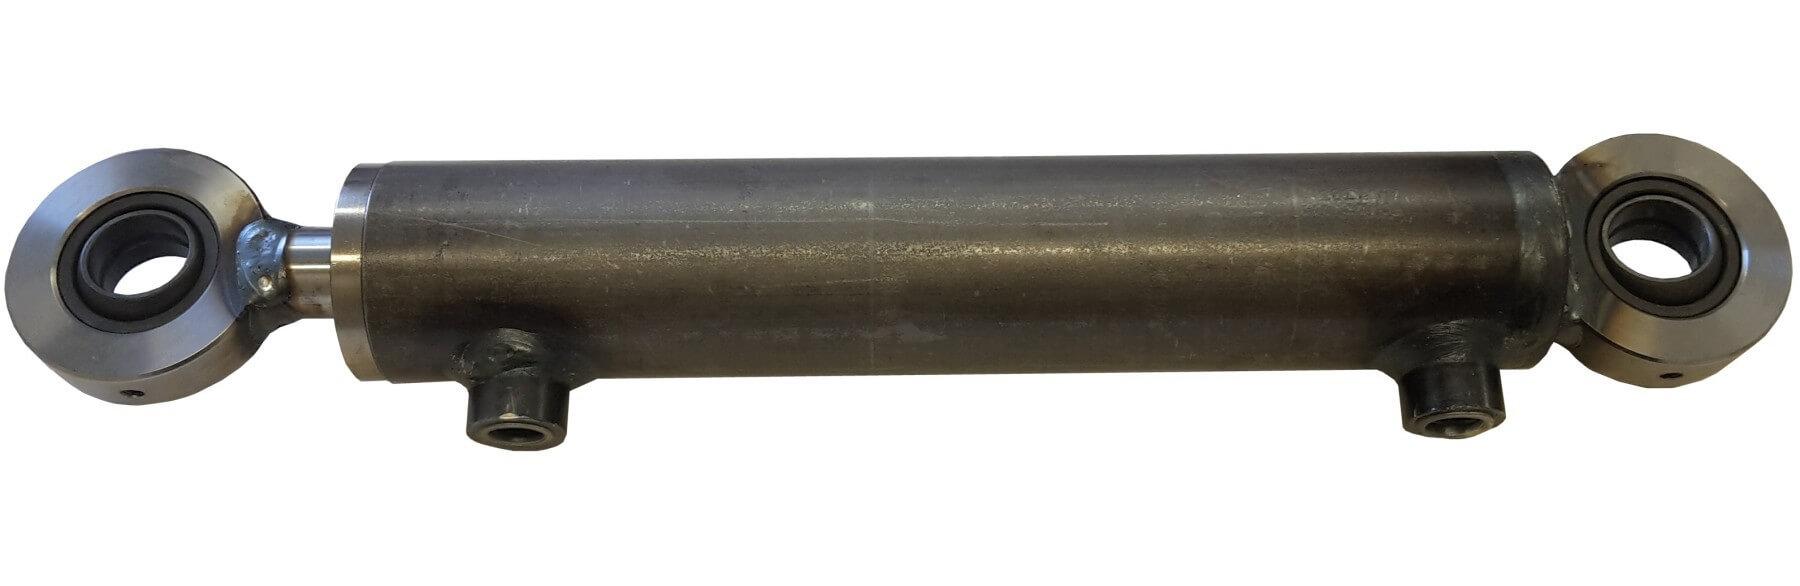 Hydraulisylinteri CL 50. 25. 250 GE